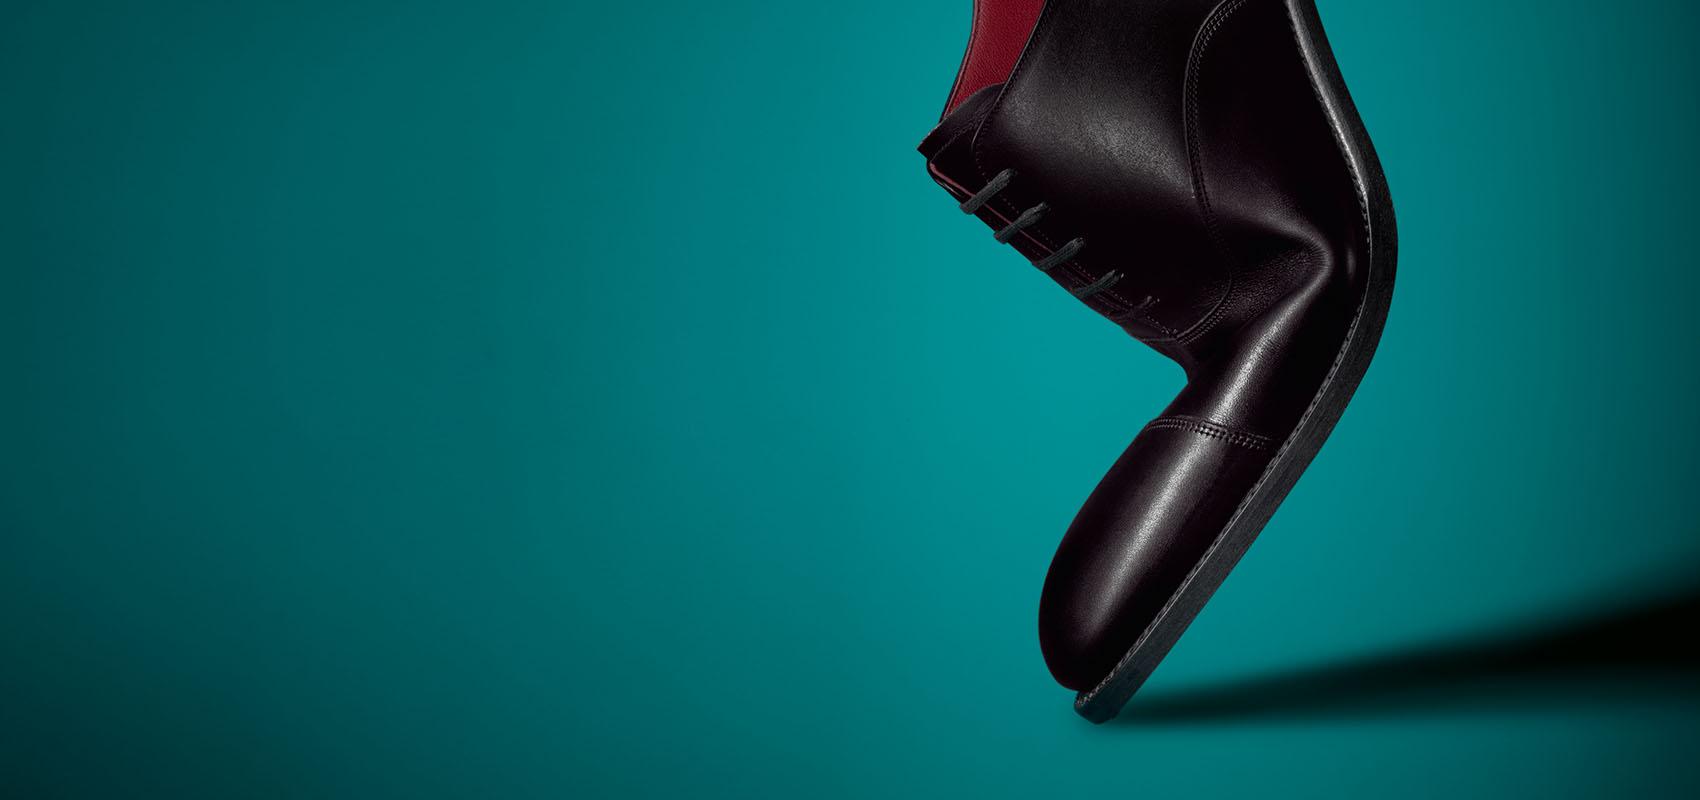 Charles Tyrwhitt Flex Sole Shoes